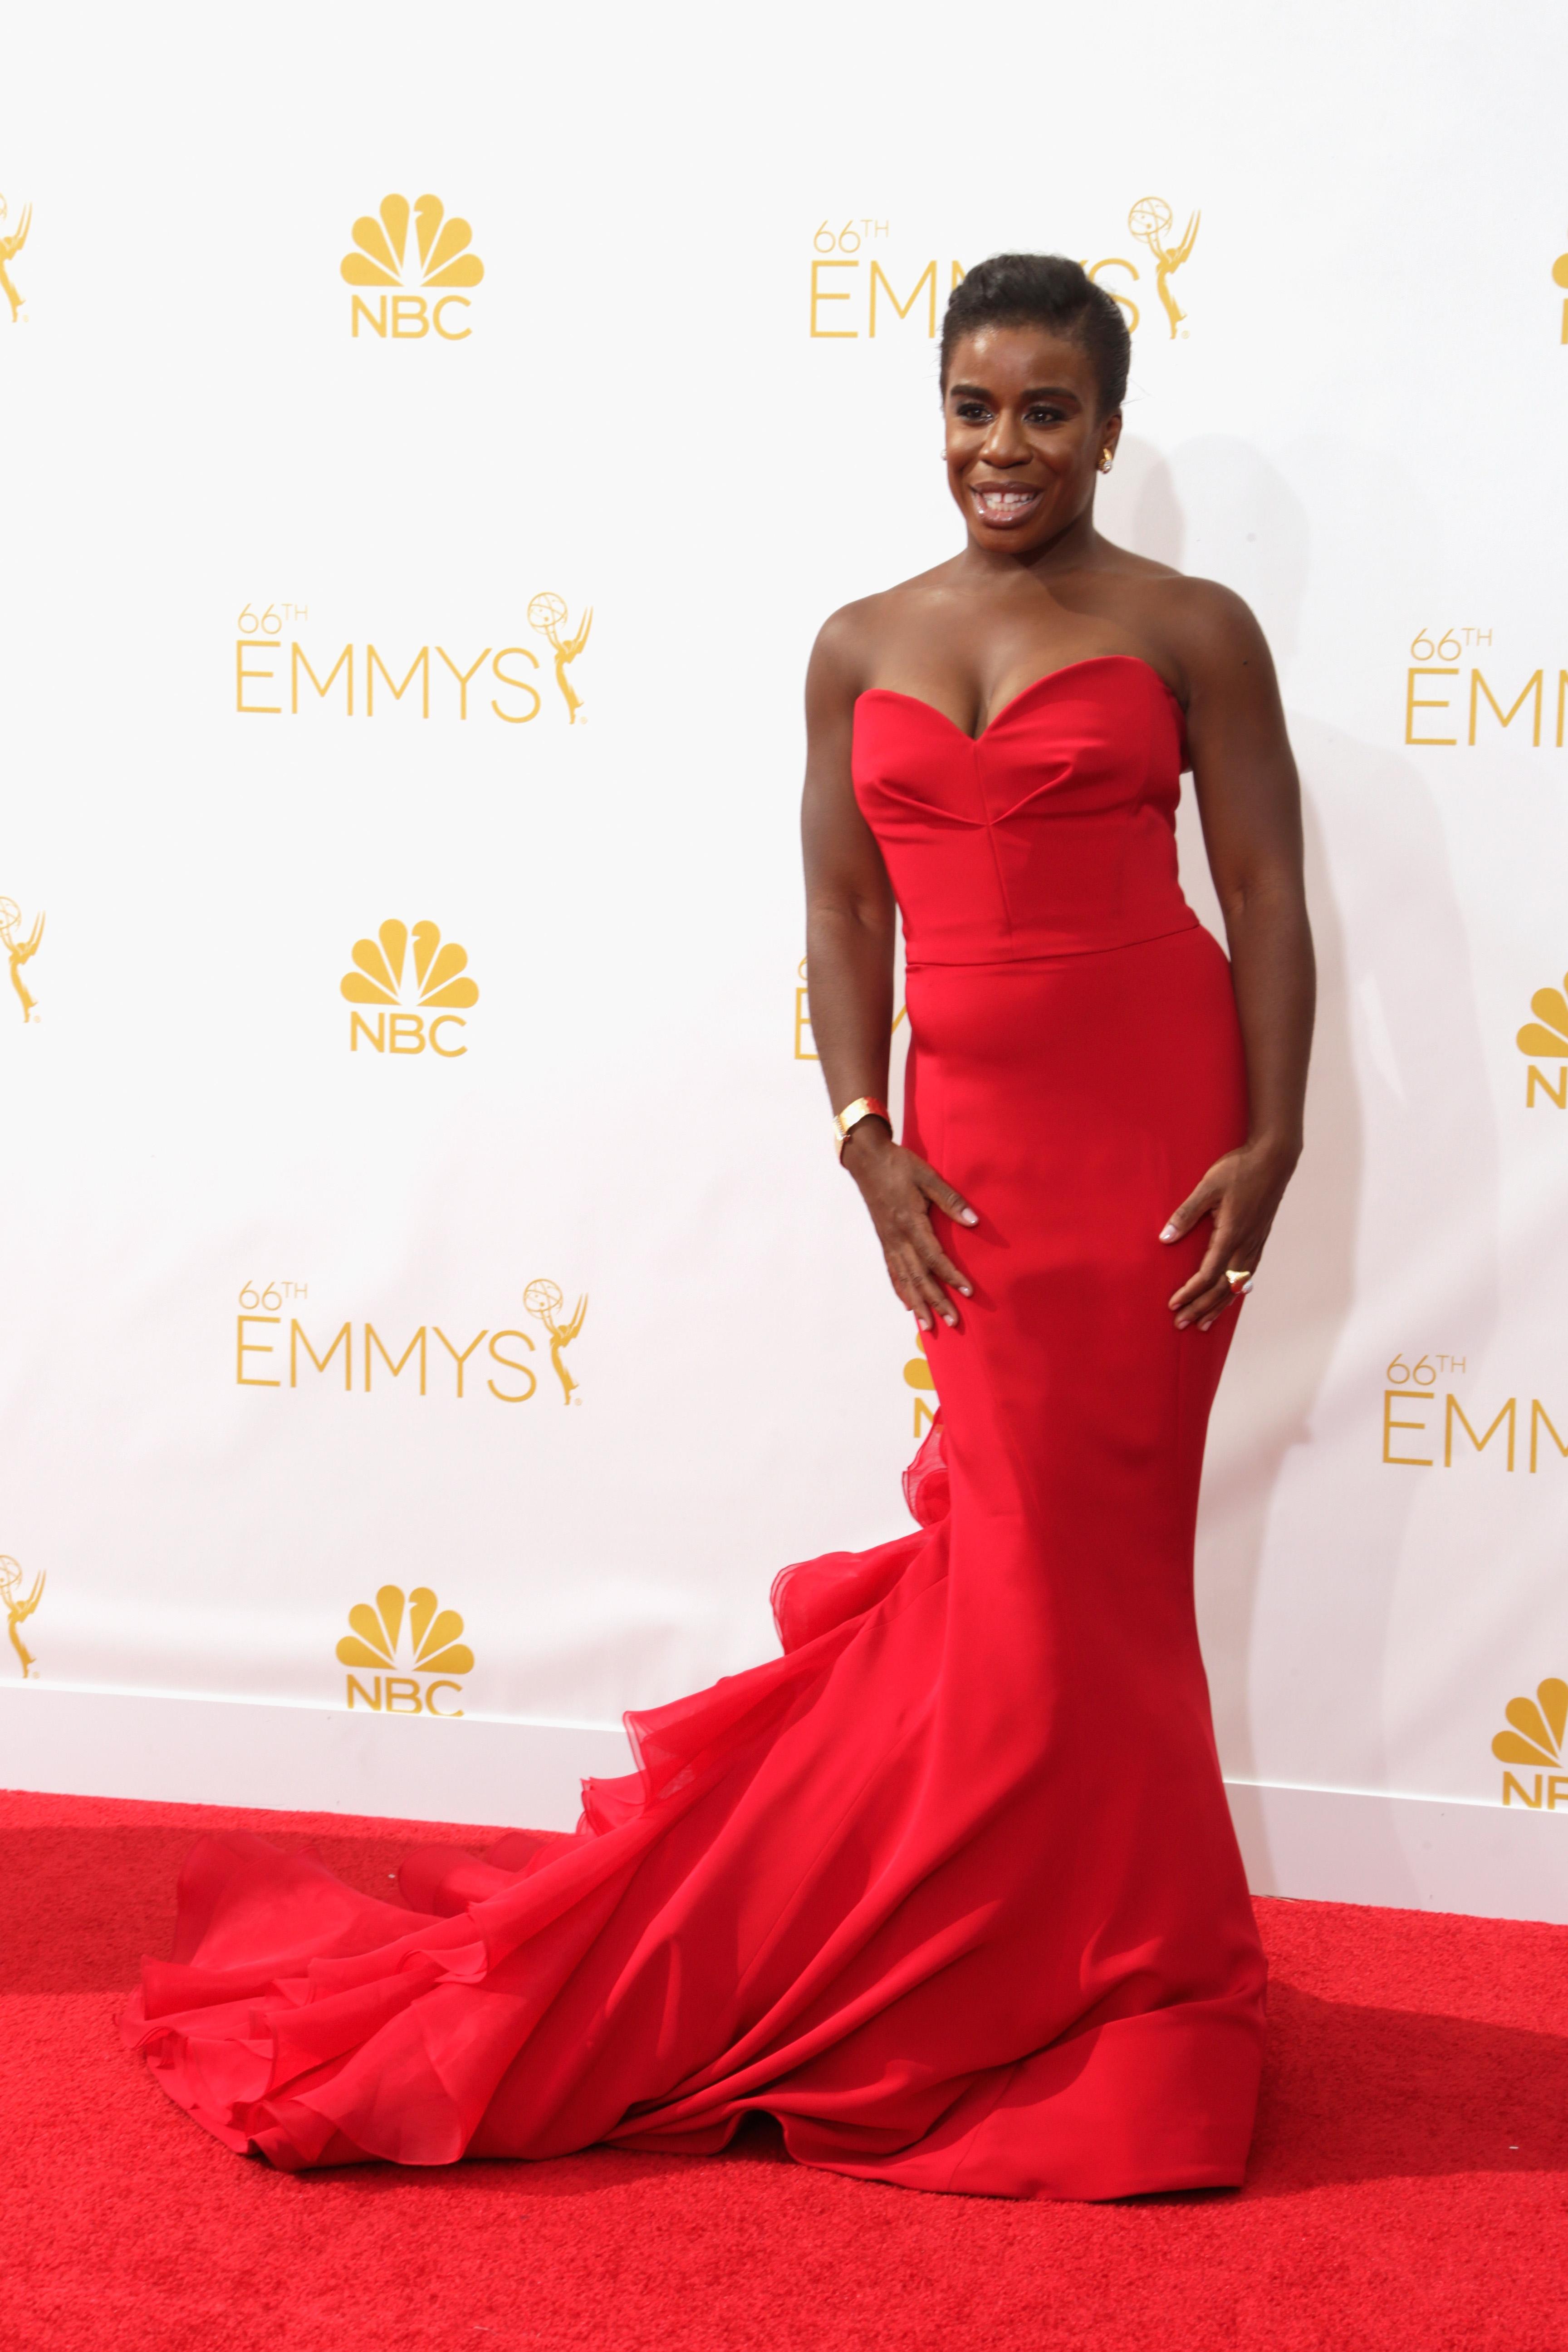 Uzo Aduba at the 2014 Emmys